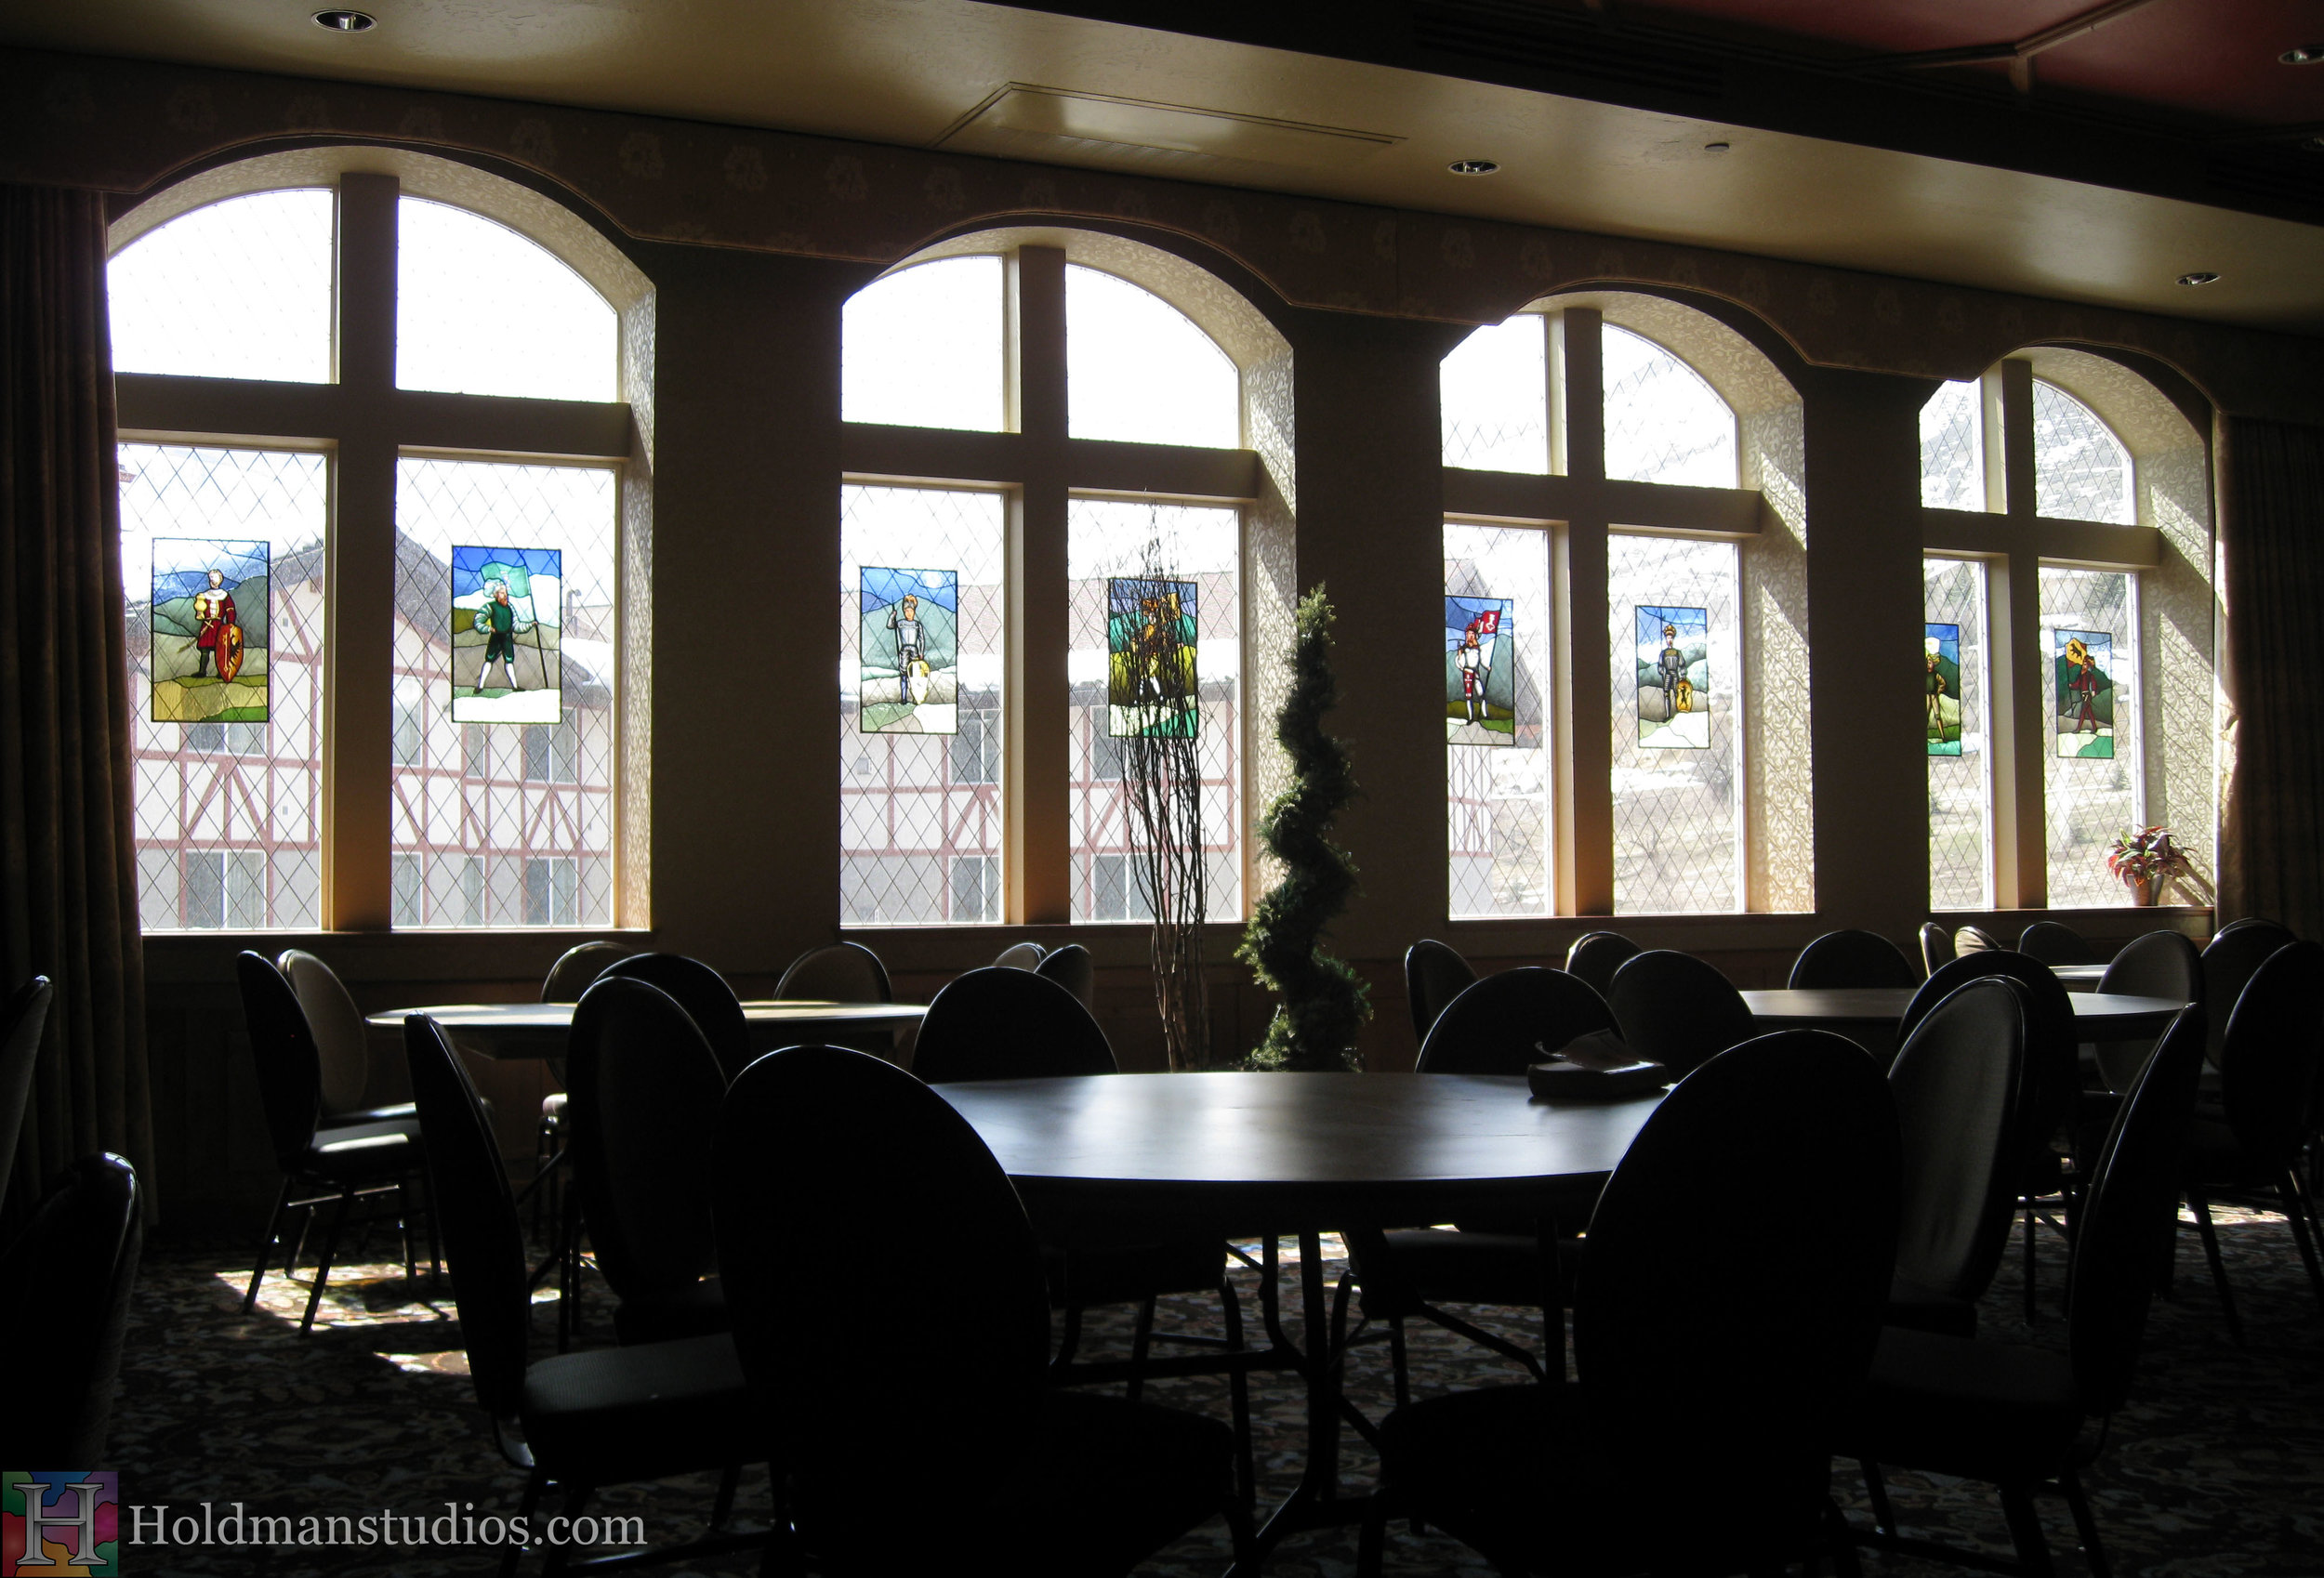 Holdman-studios-stained-glass-windows-zermatt-resort-swiss-heritage.jpg